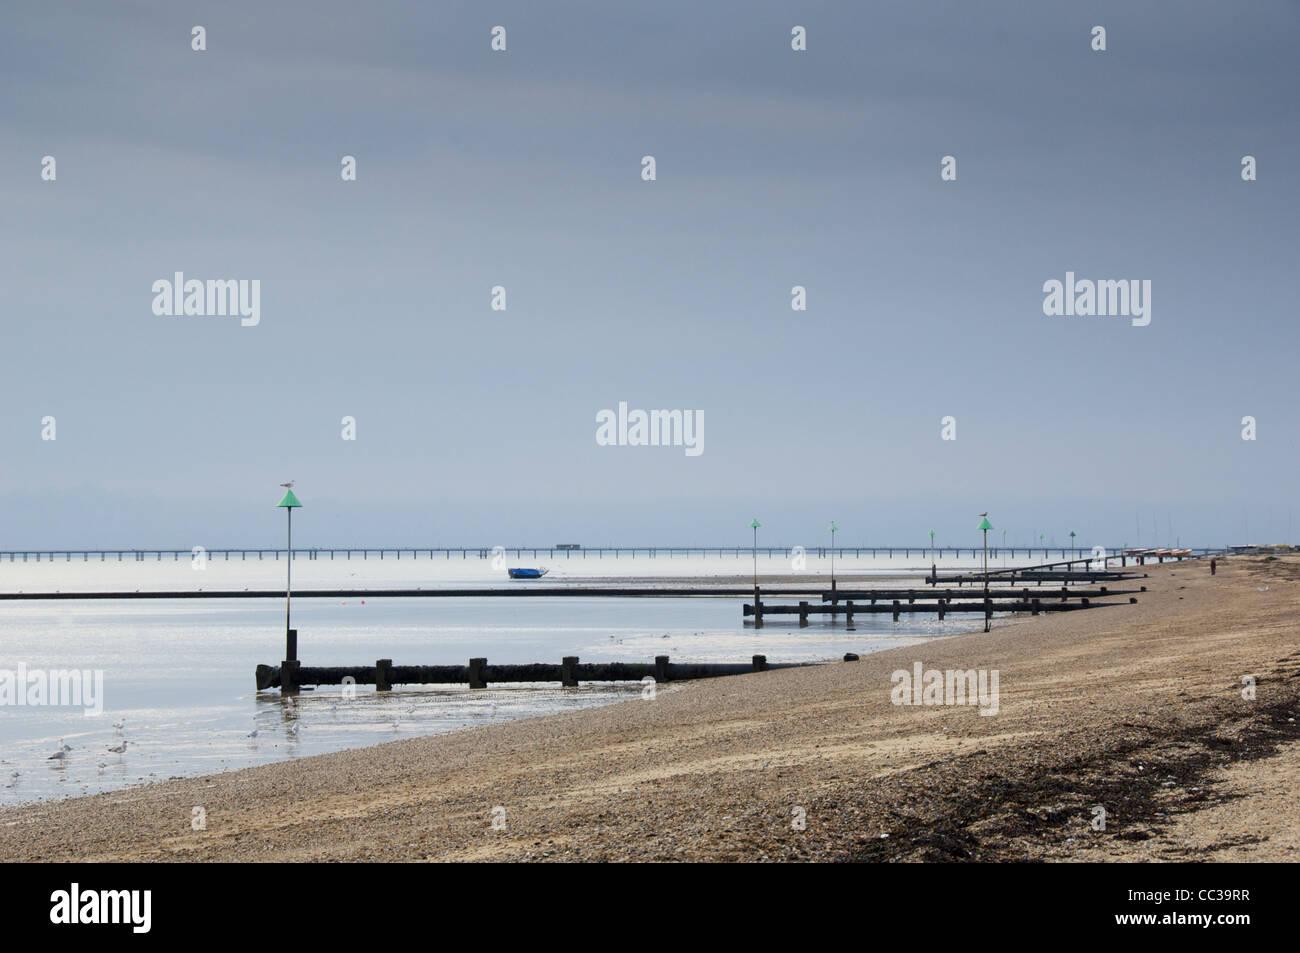 Groynes on the beach at Shoeburyness, Southend-on-Sea - Stock Image